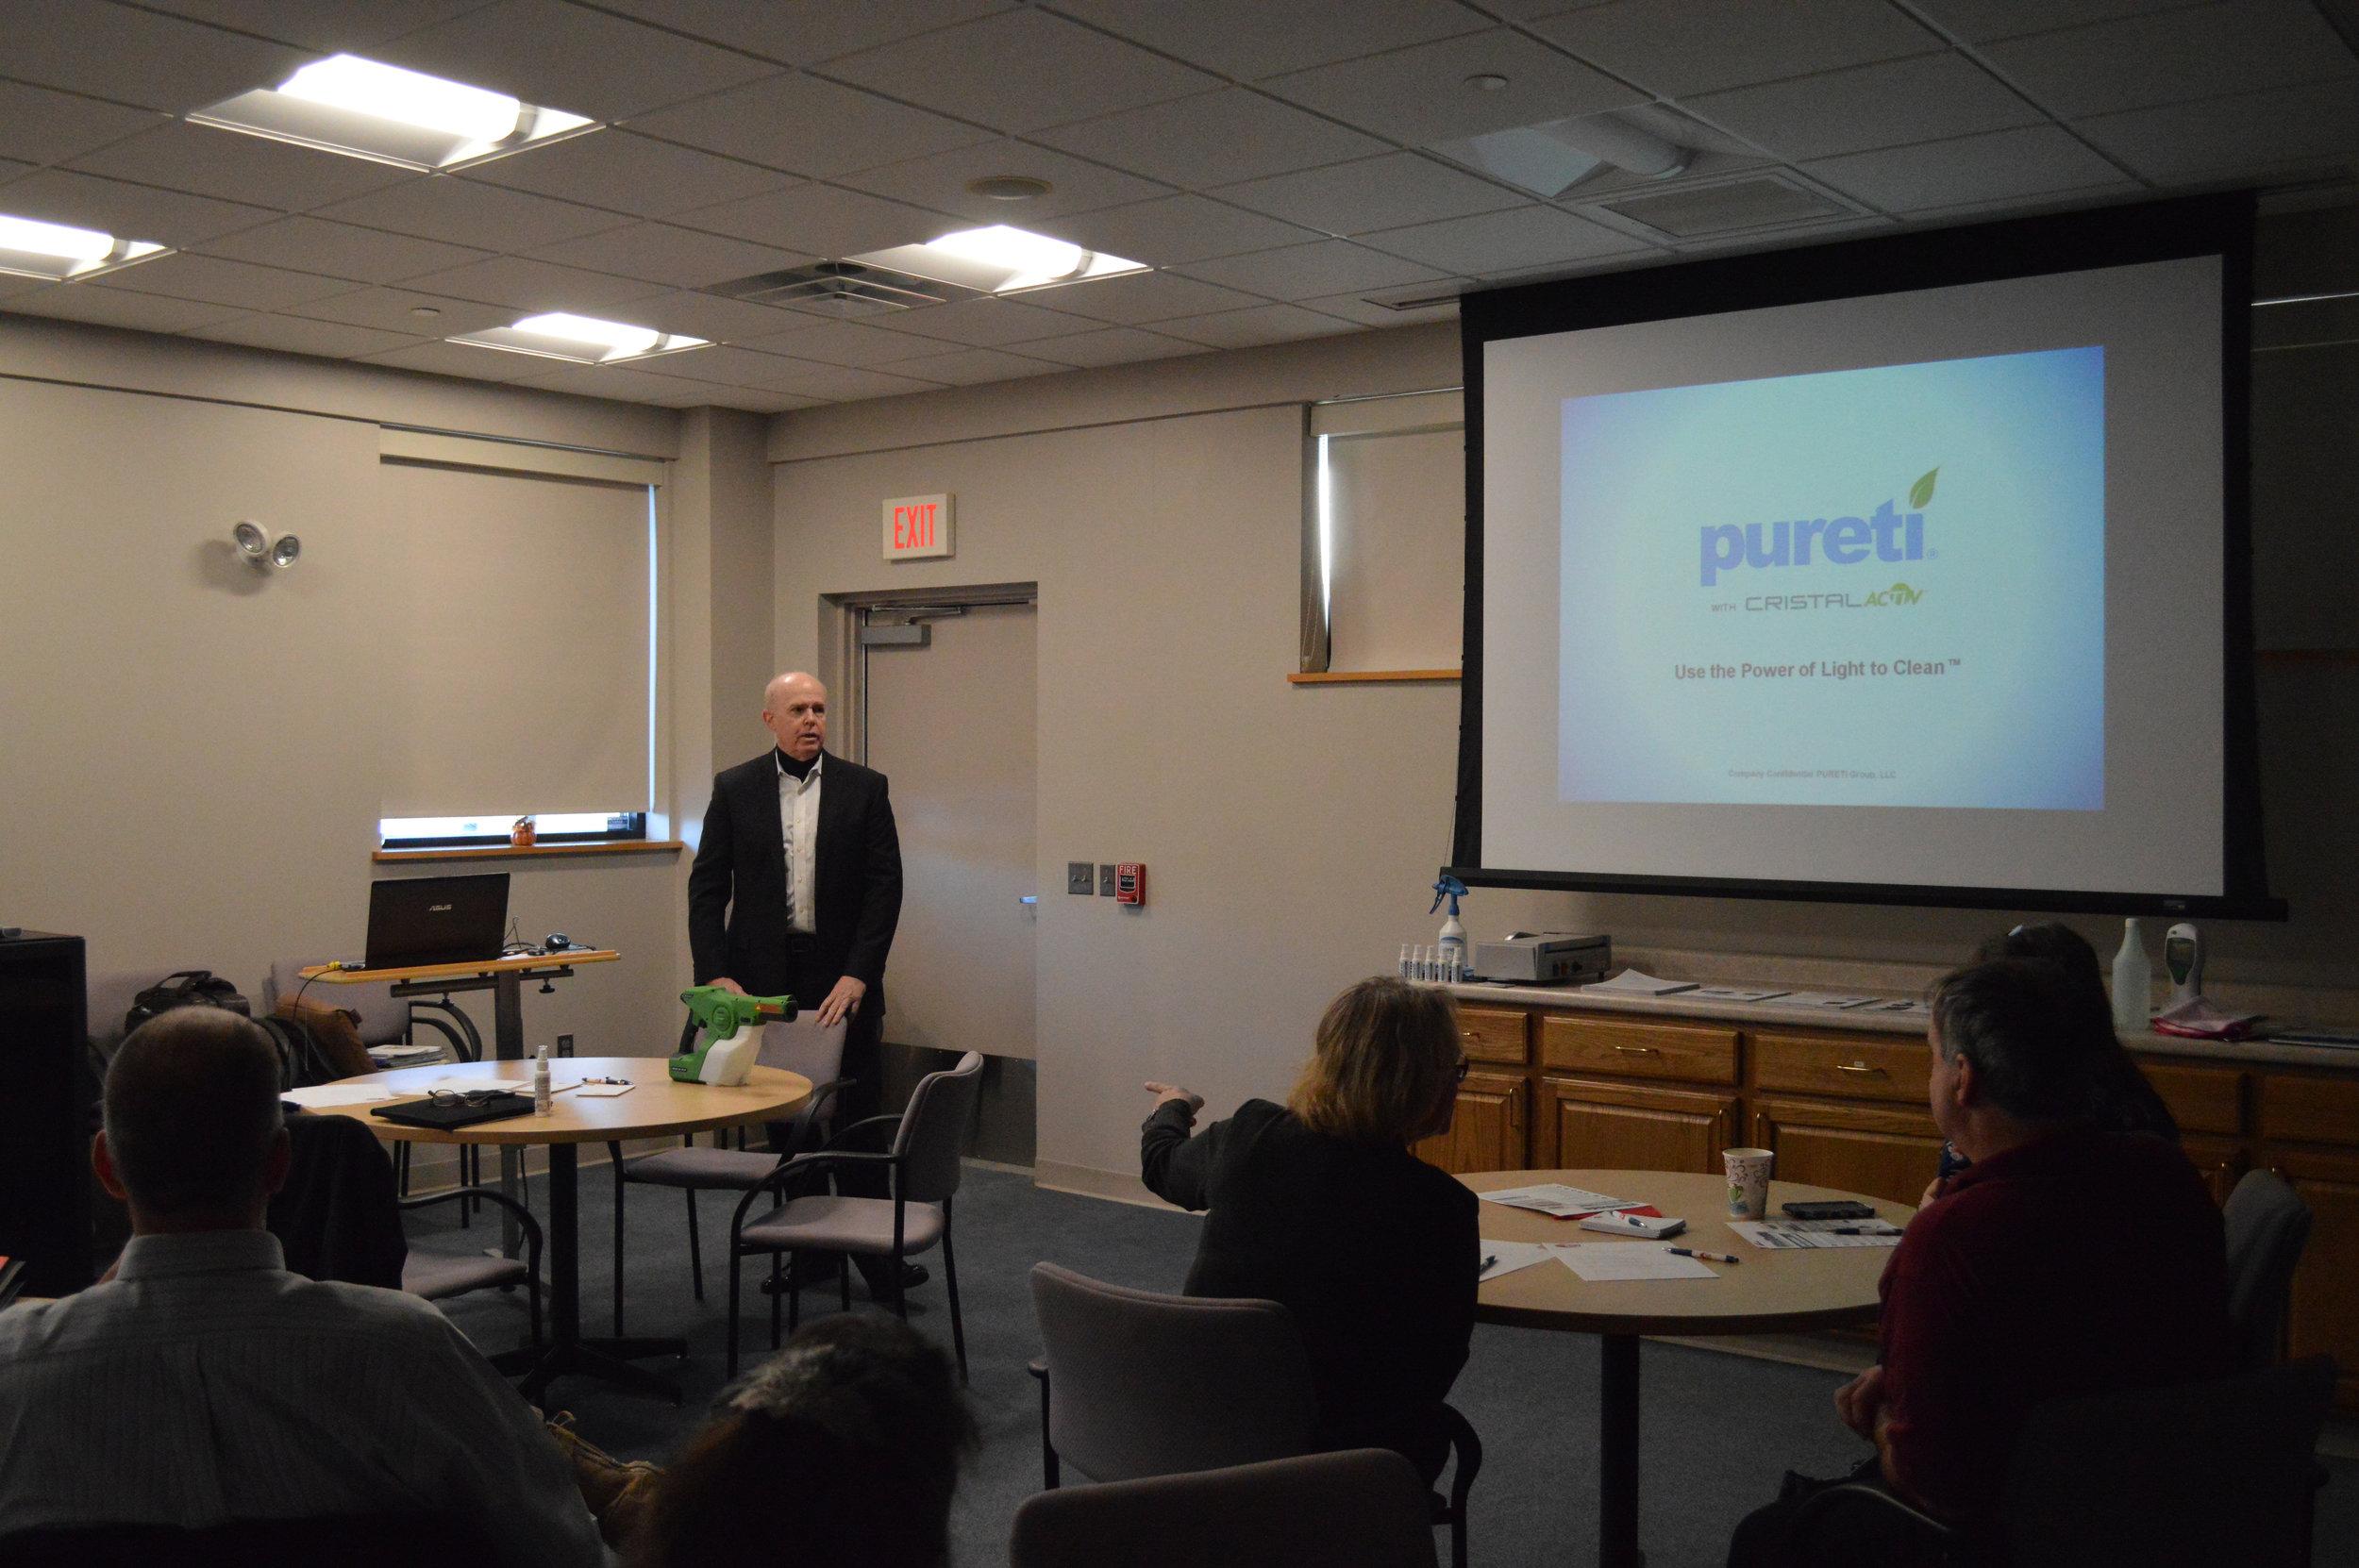 Glen Finkle, Pureti Systems